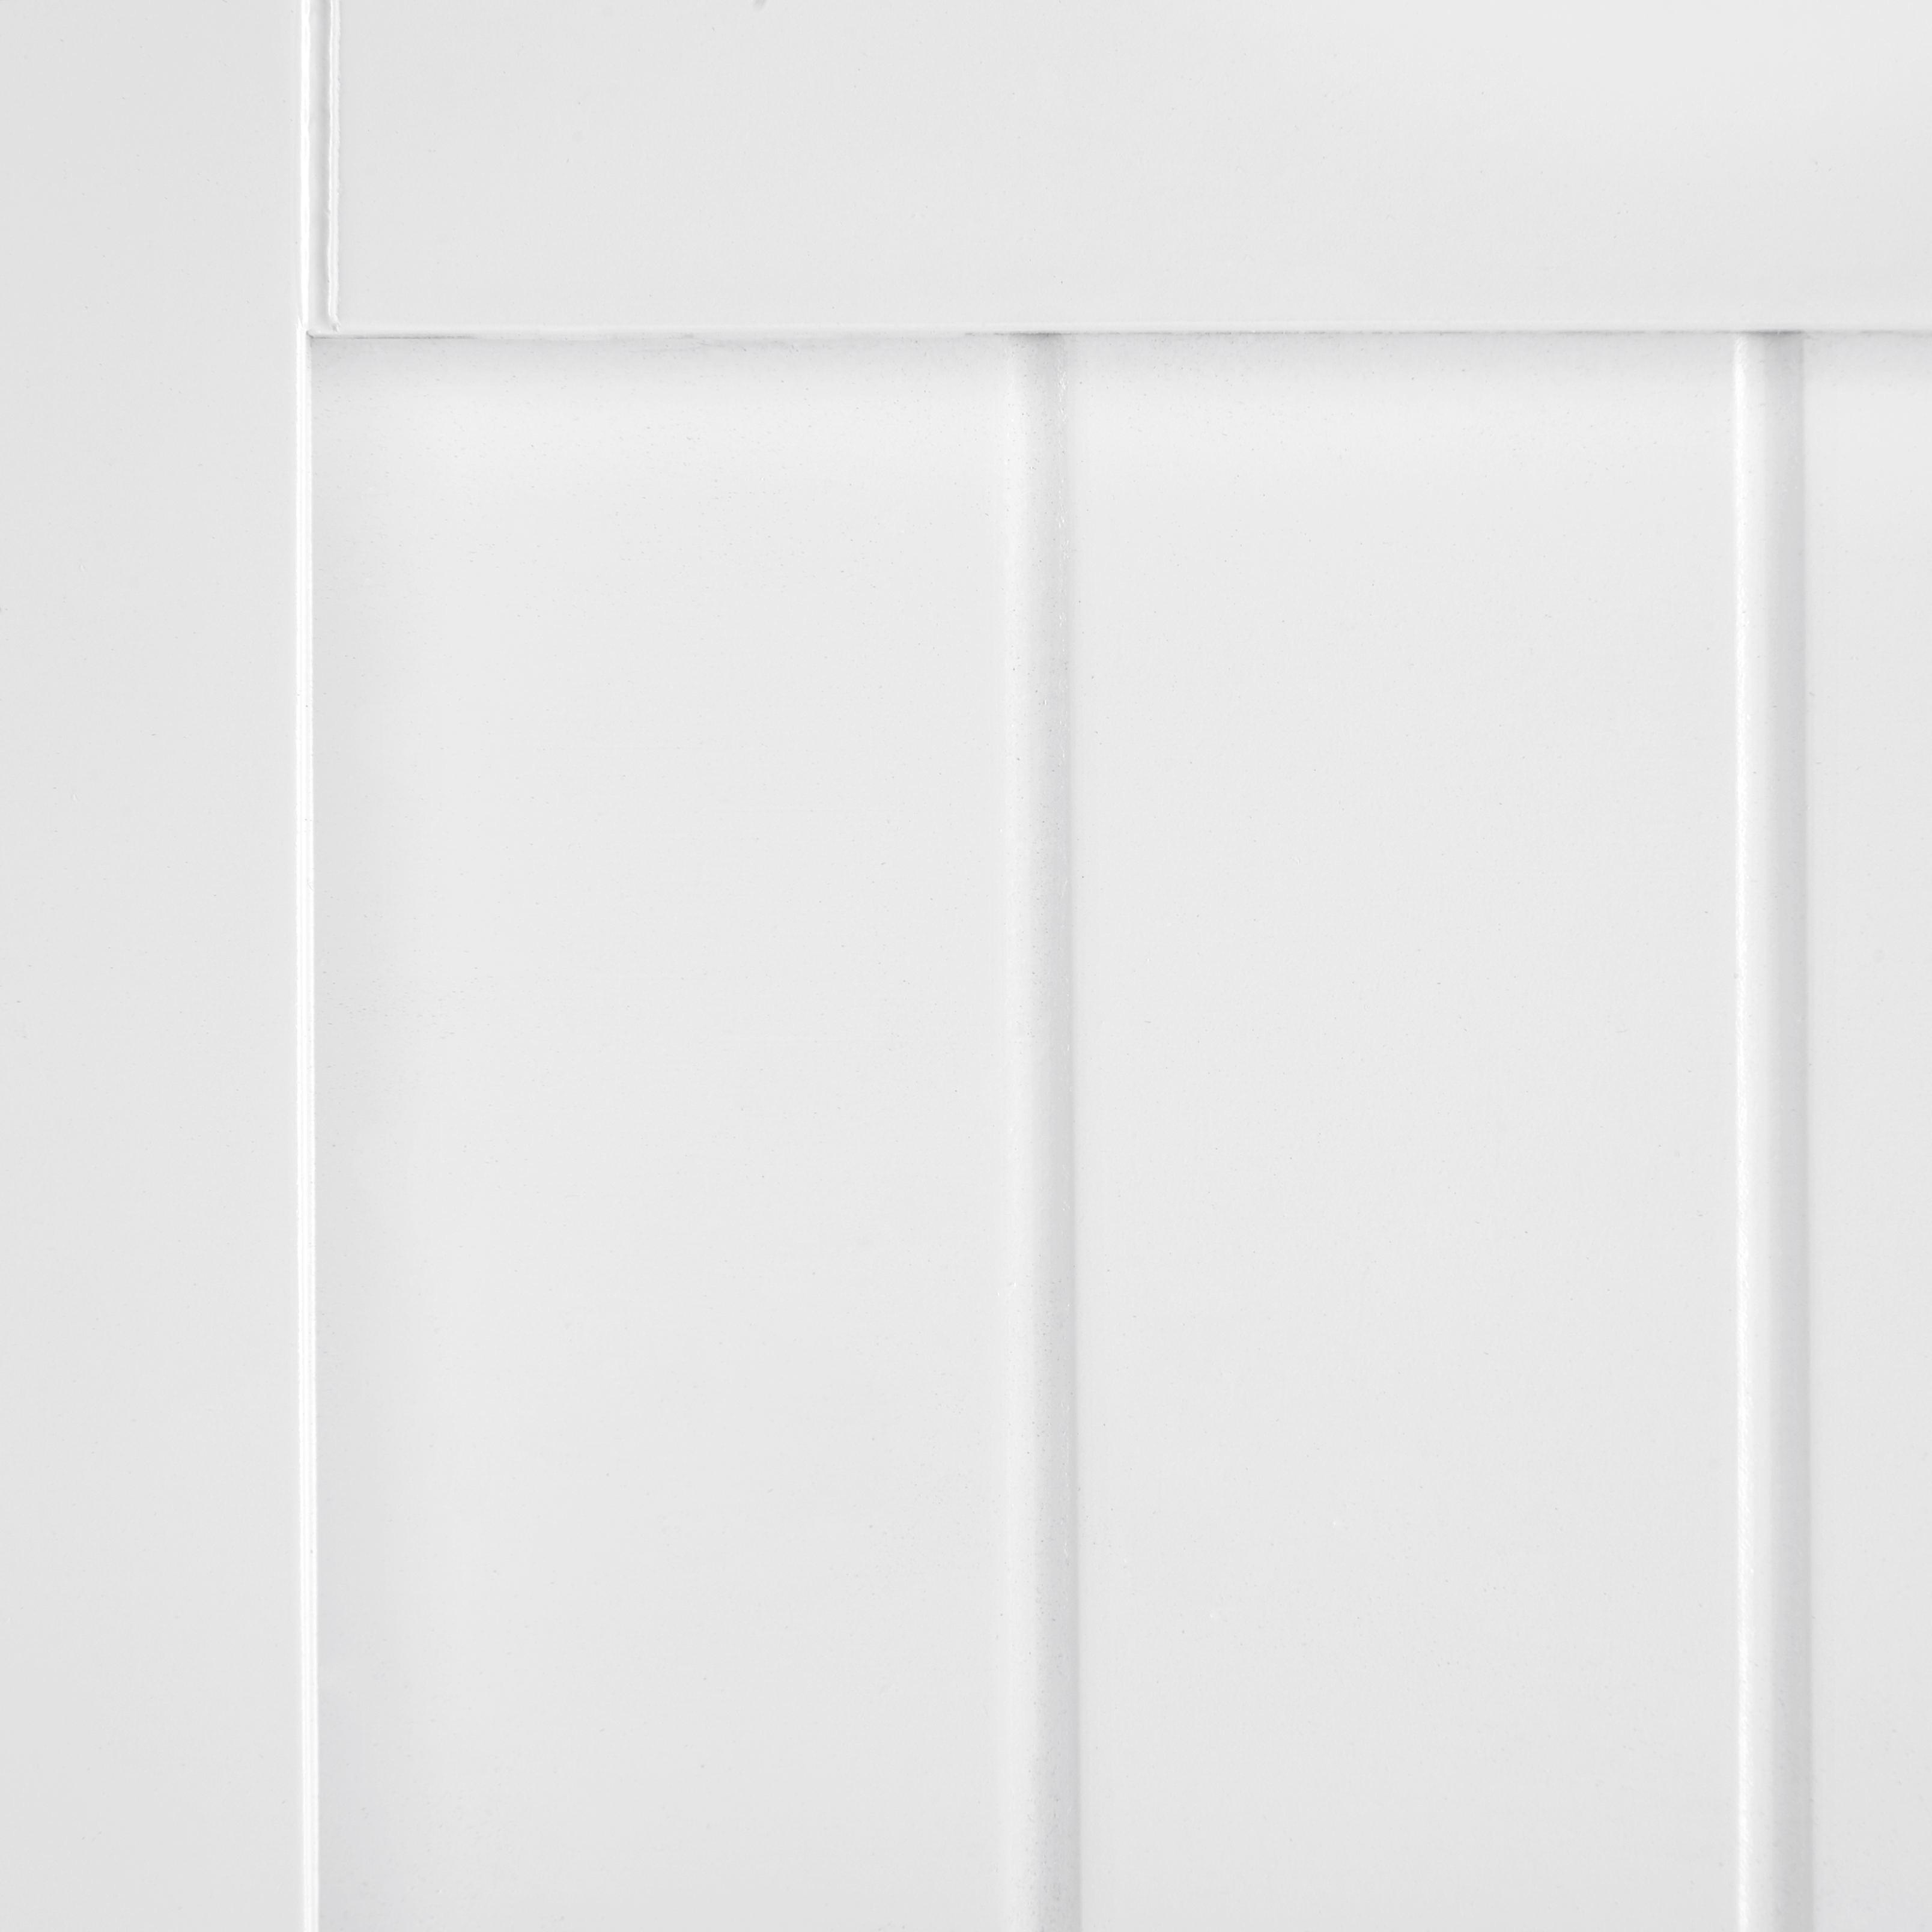 Badezimmerregal Bianca - Weiß, MODERN, Holz (30/101/30cm) - MÖMAX modern living